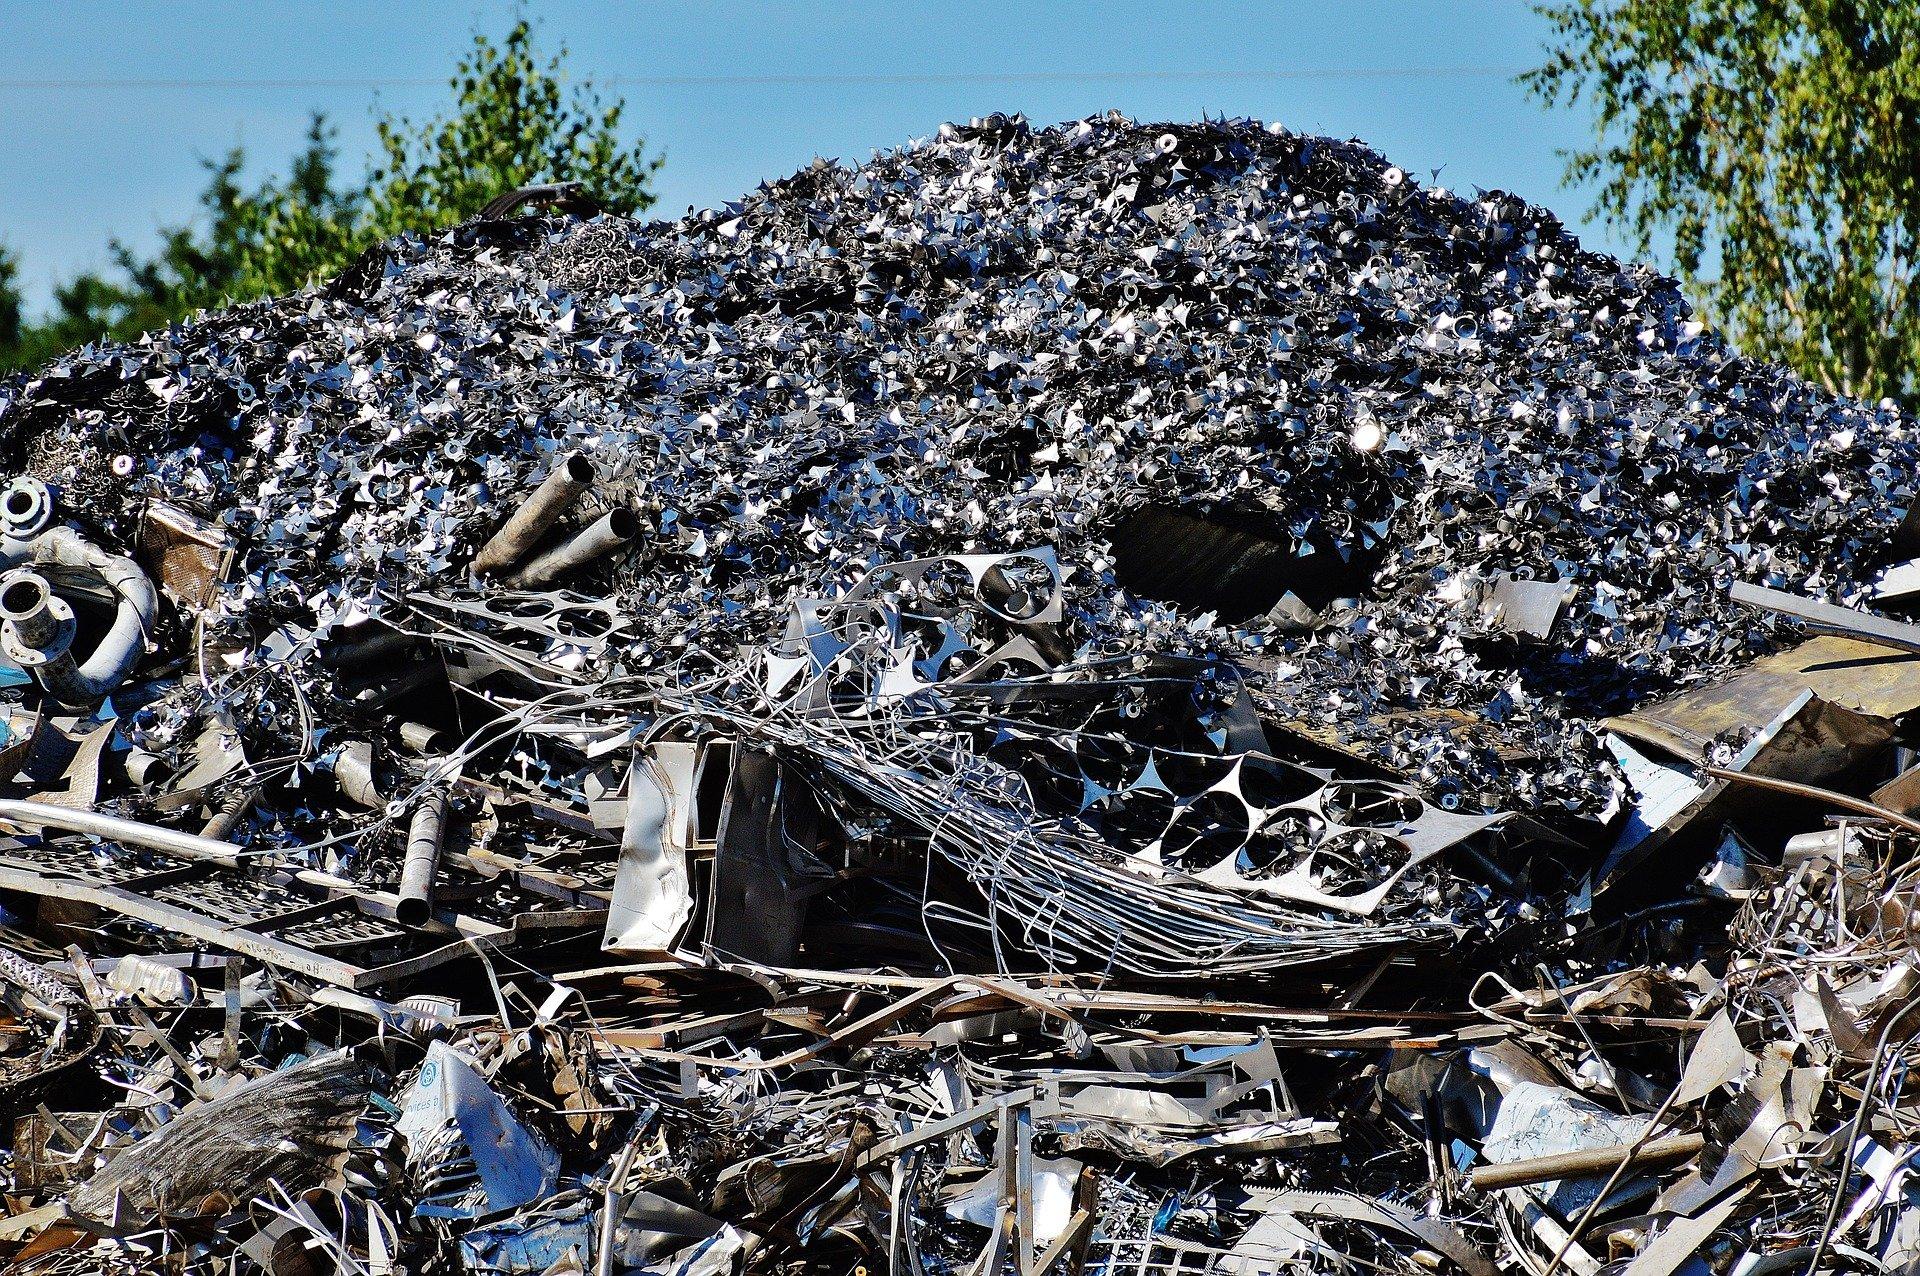 Settore ecologia: recupero rottami ferrosi